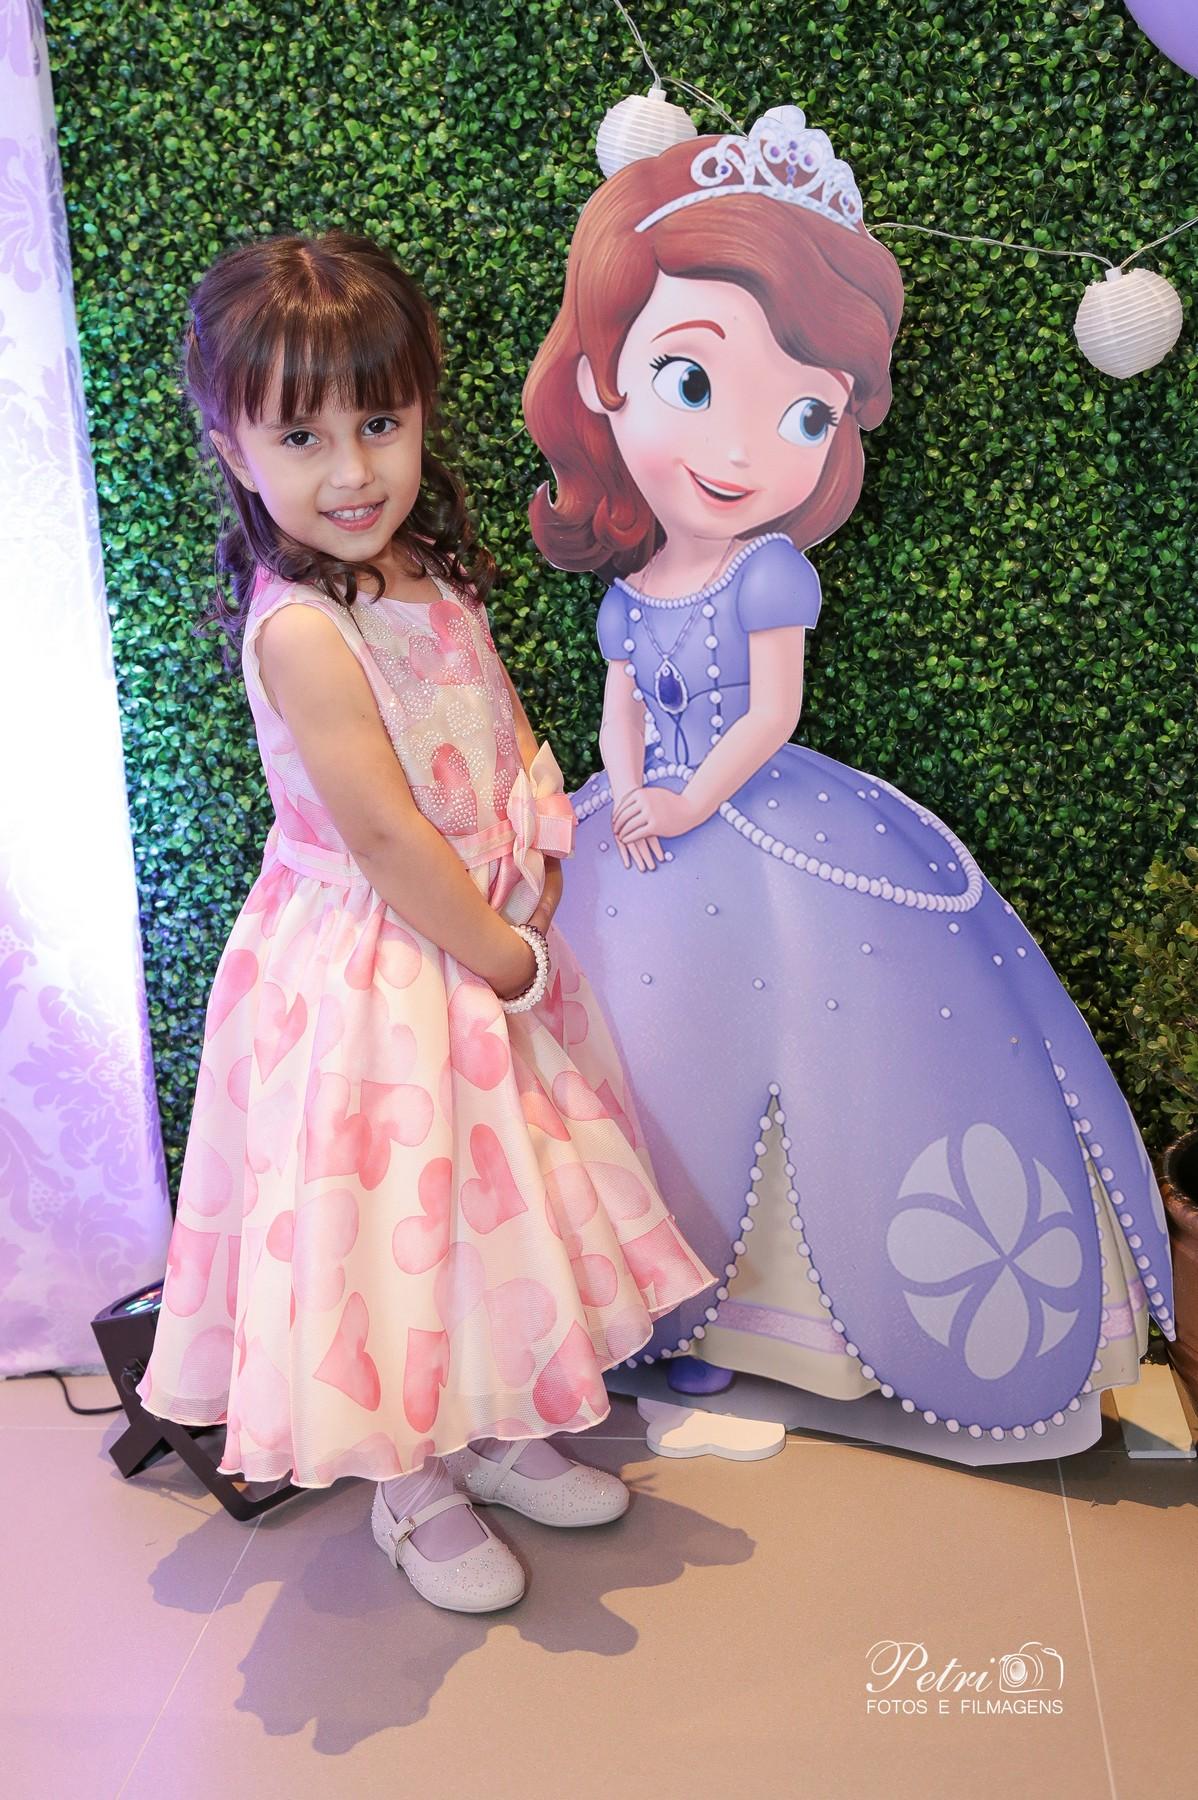 Fazendo pose igual a princesa Sophia